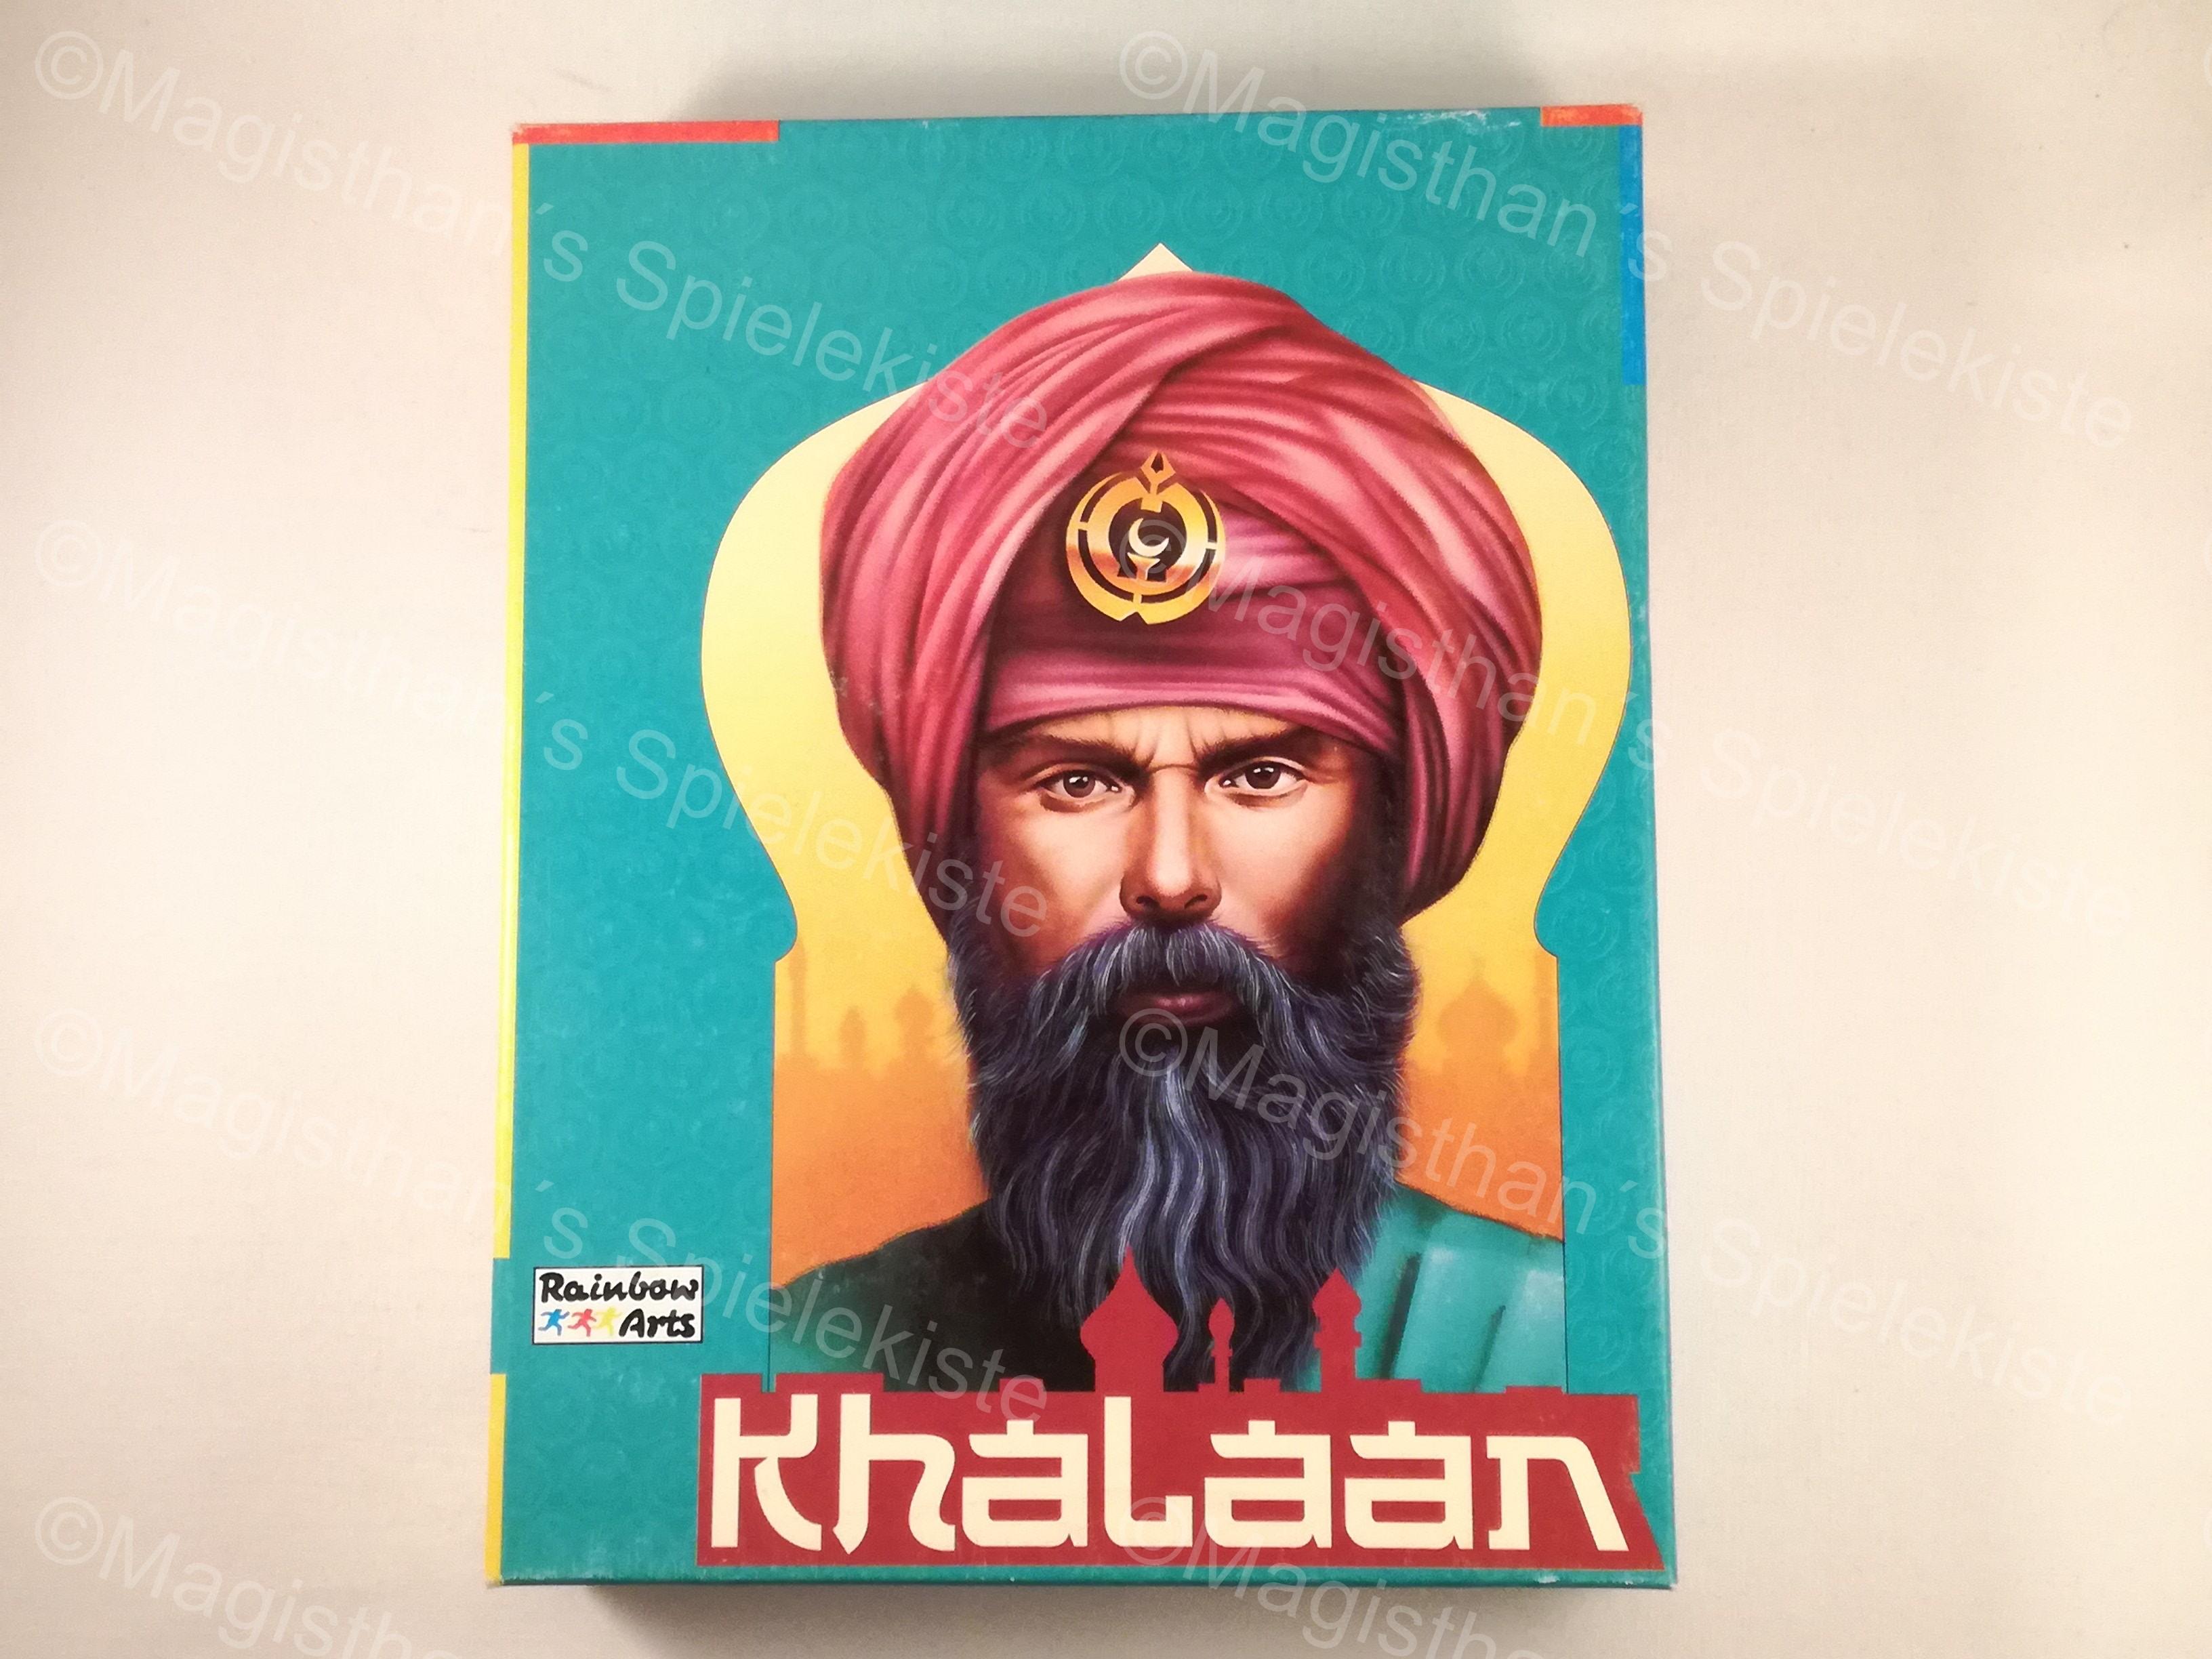 Khalaan1b.jpg